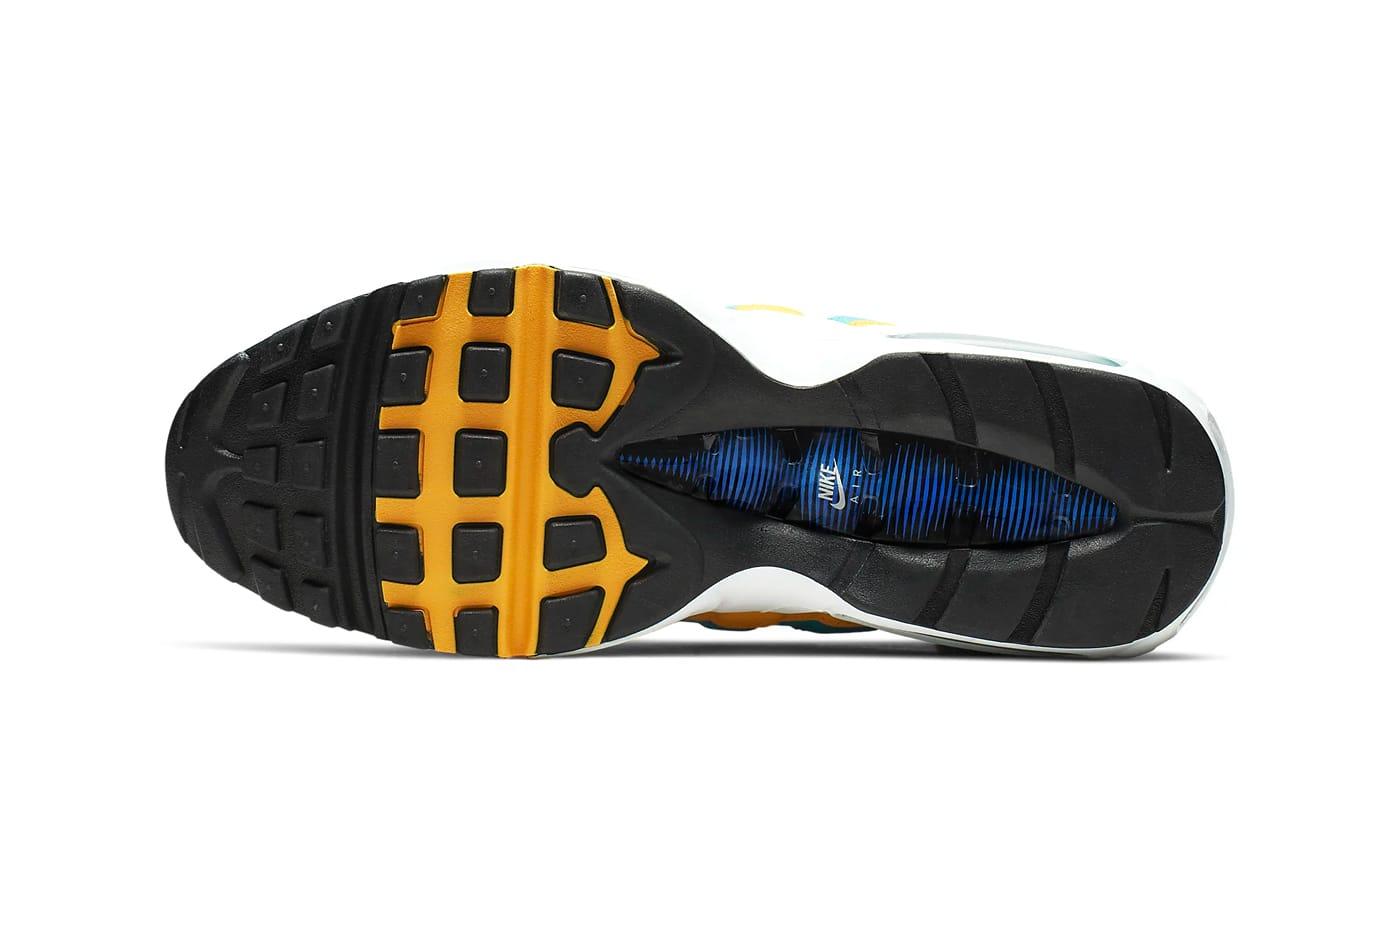 Nike Windbreaker-Inspired Air Max 95